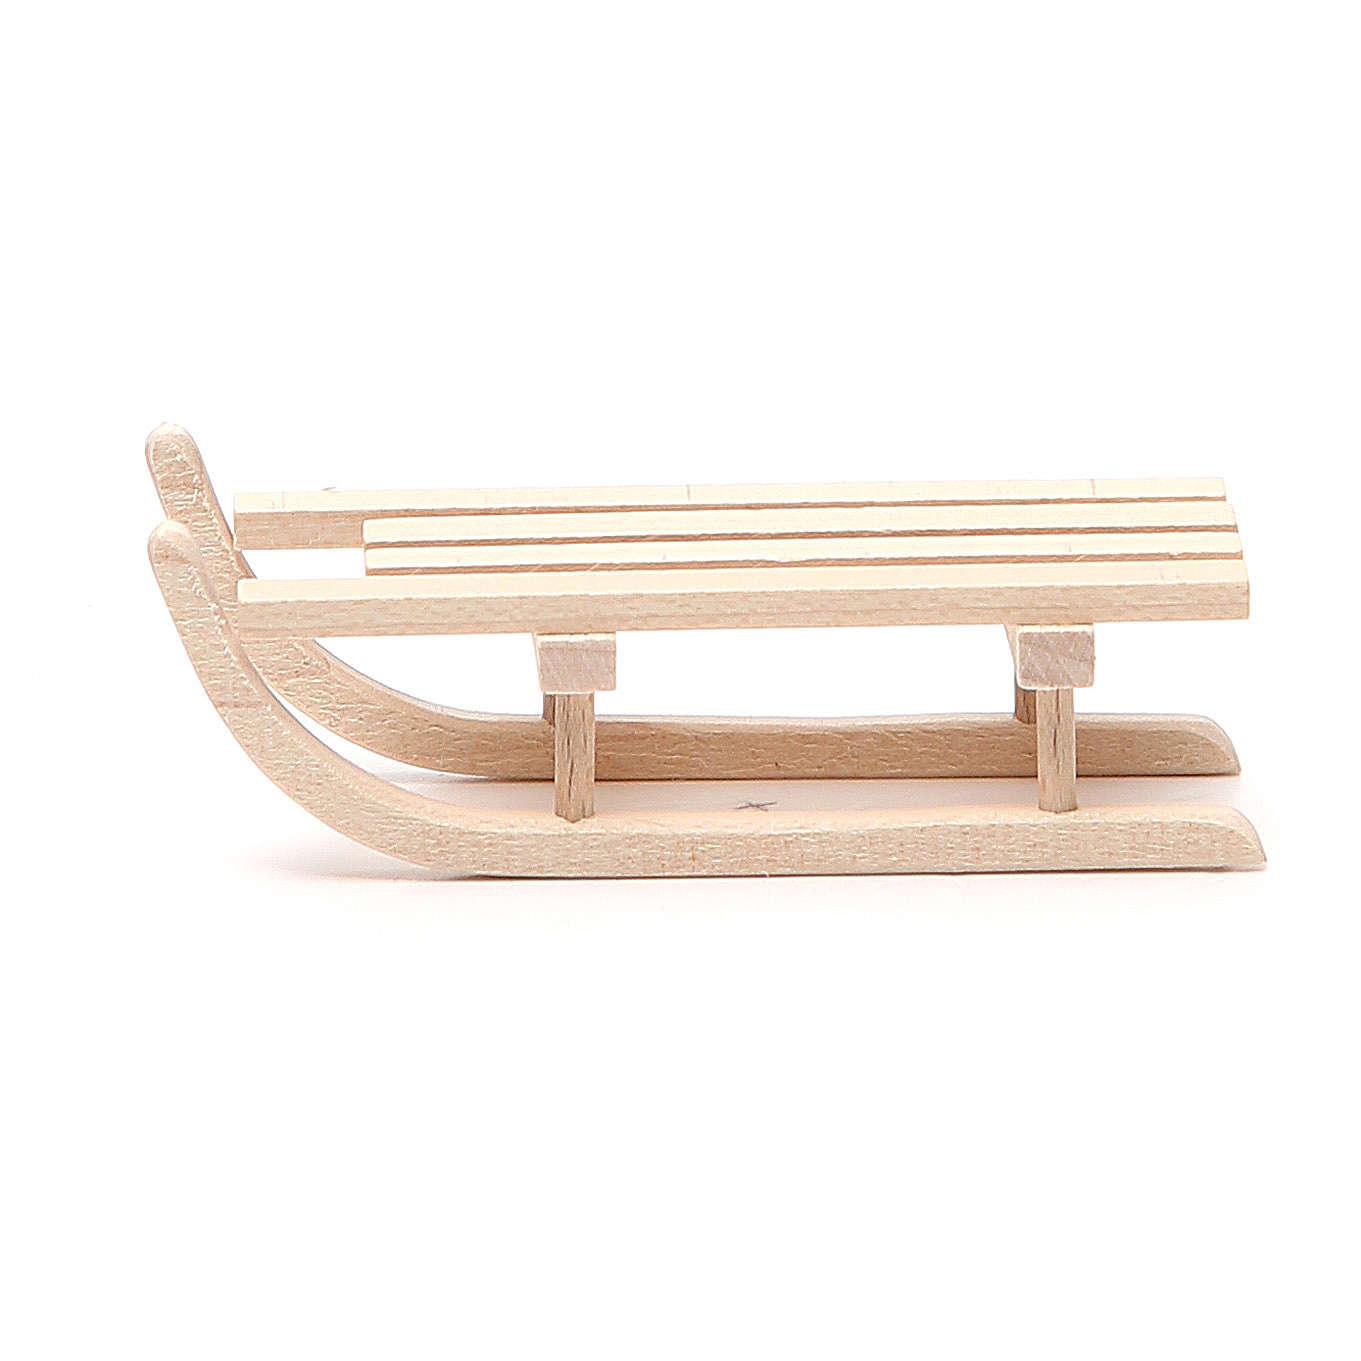 Traîneau en bois pour crèche 2,5x3,5x9 cm 4